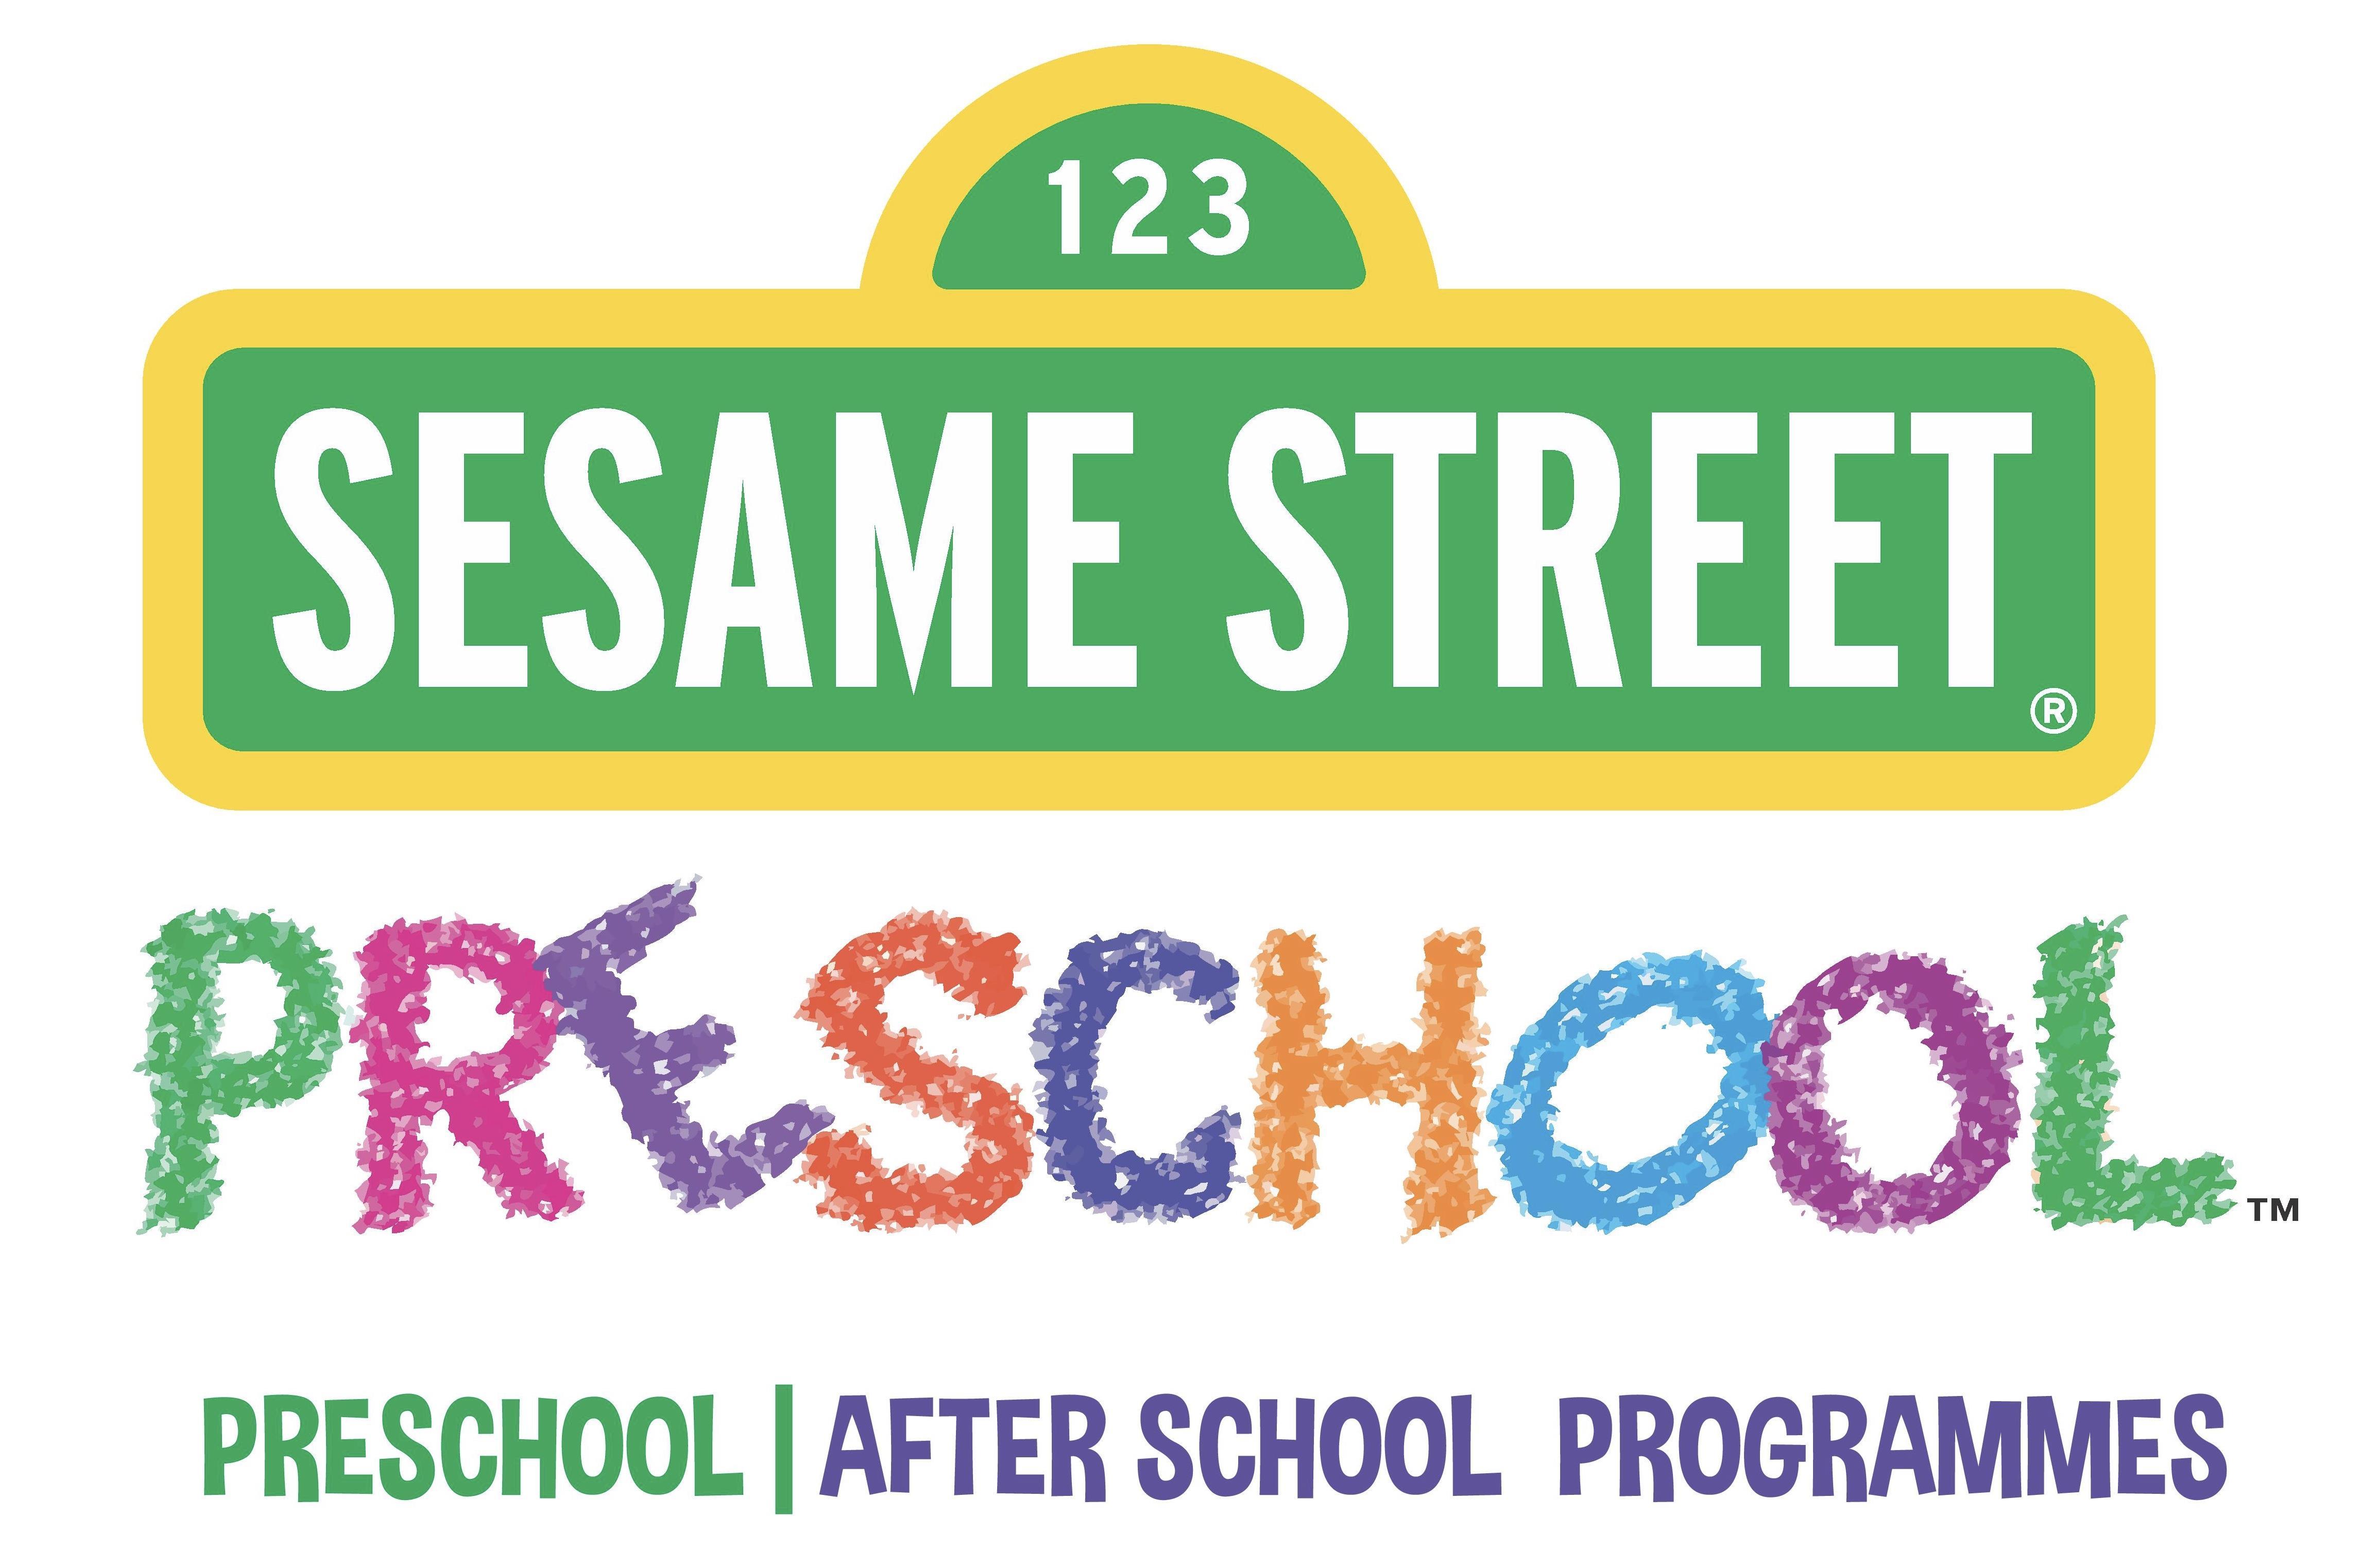 Sesame Street - Subhash Nagar - Gandhidham Image